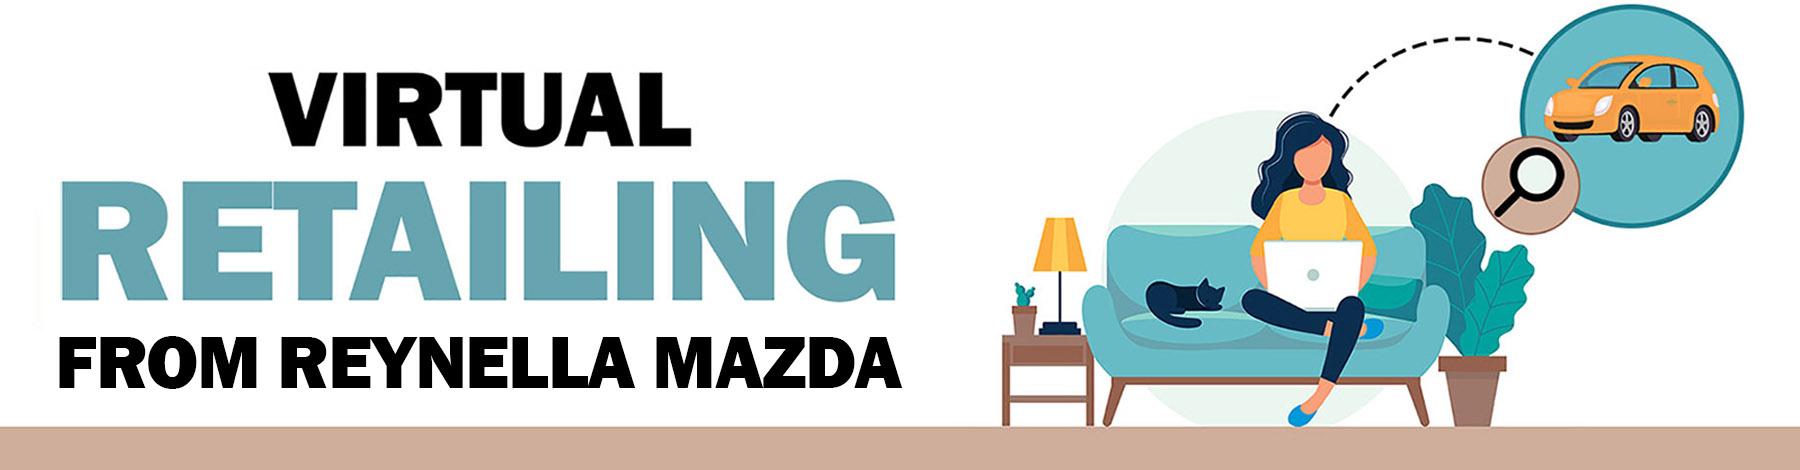 Reynella Mazda Virtual Retailing